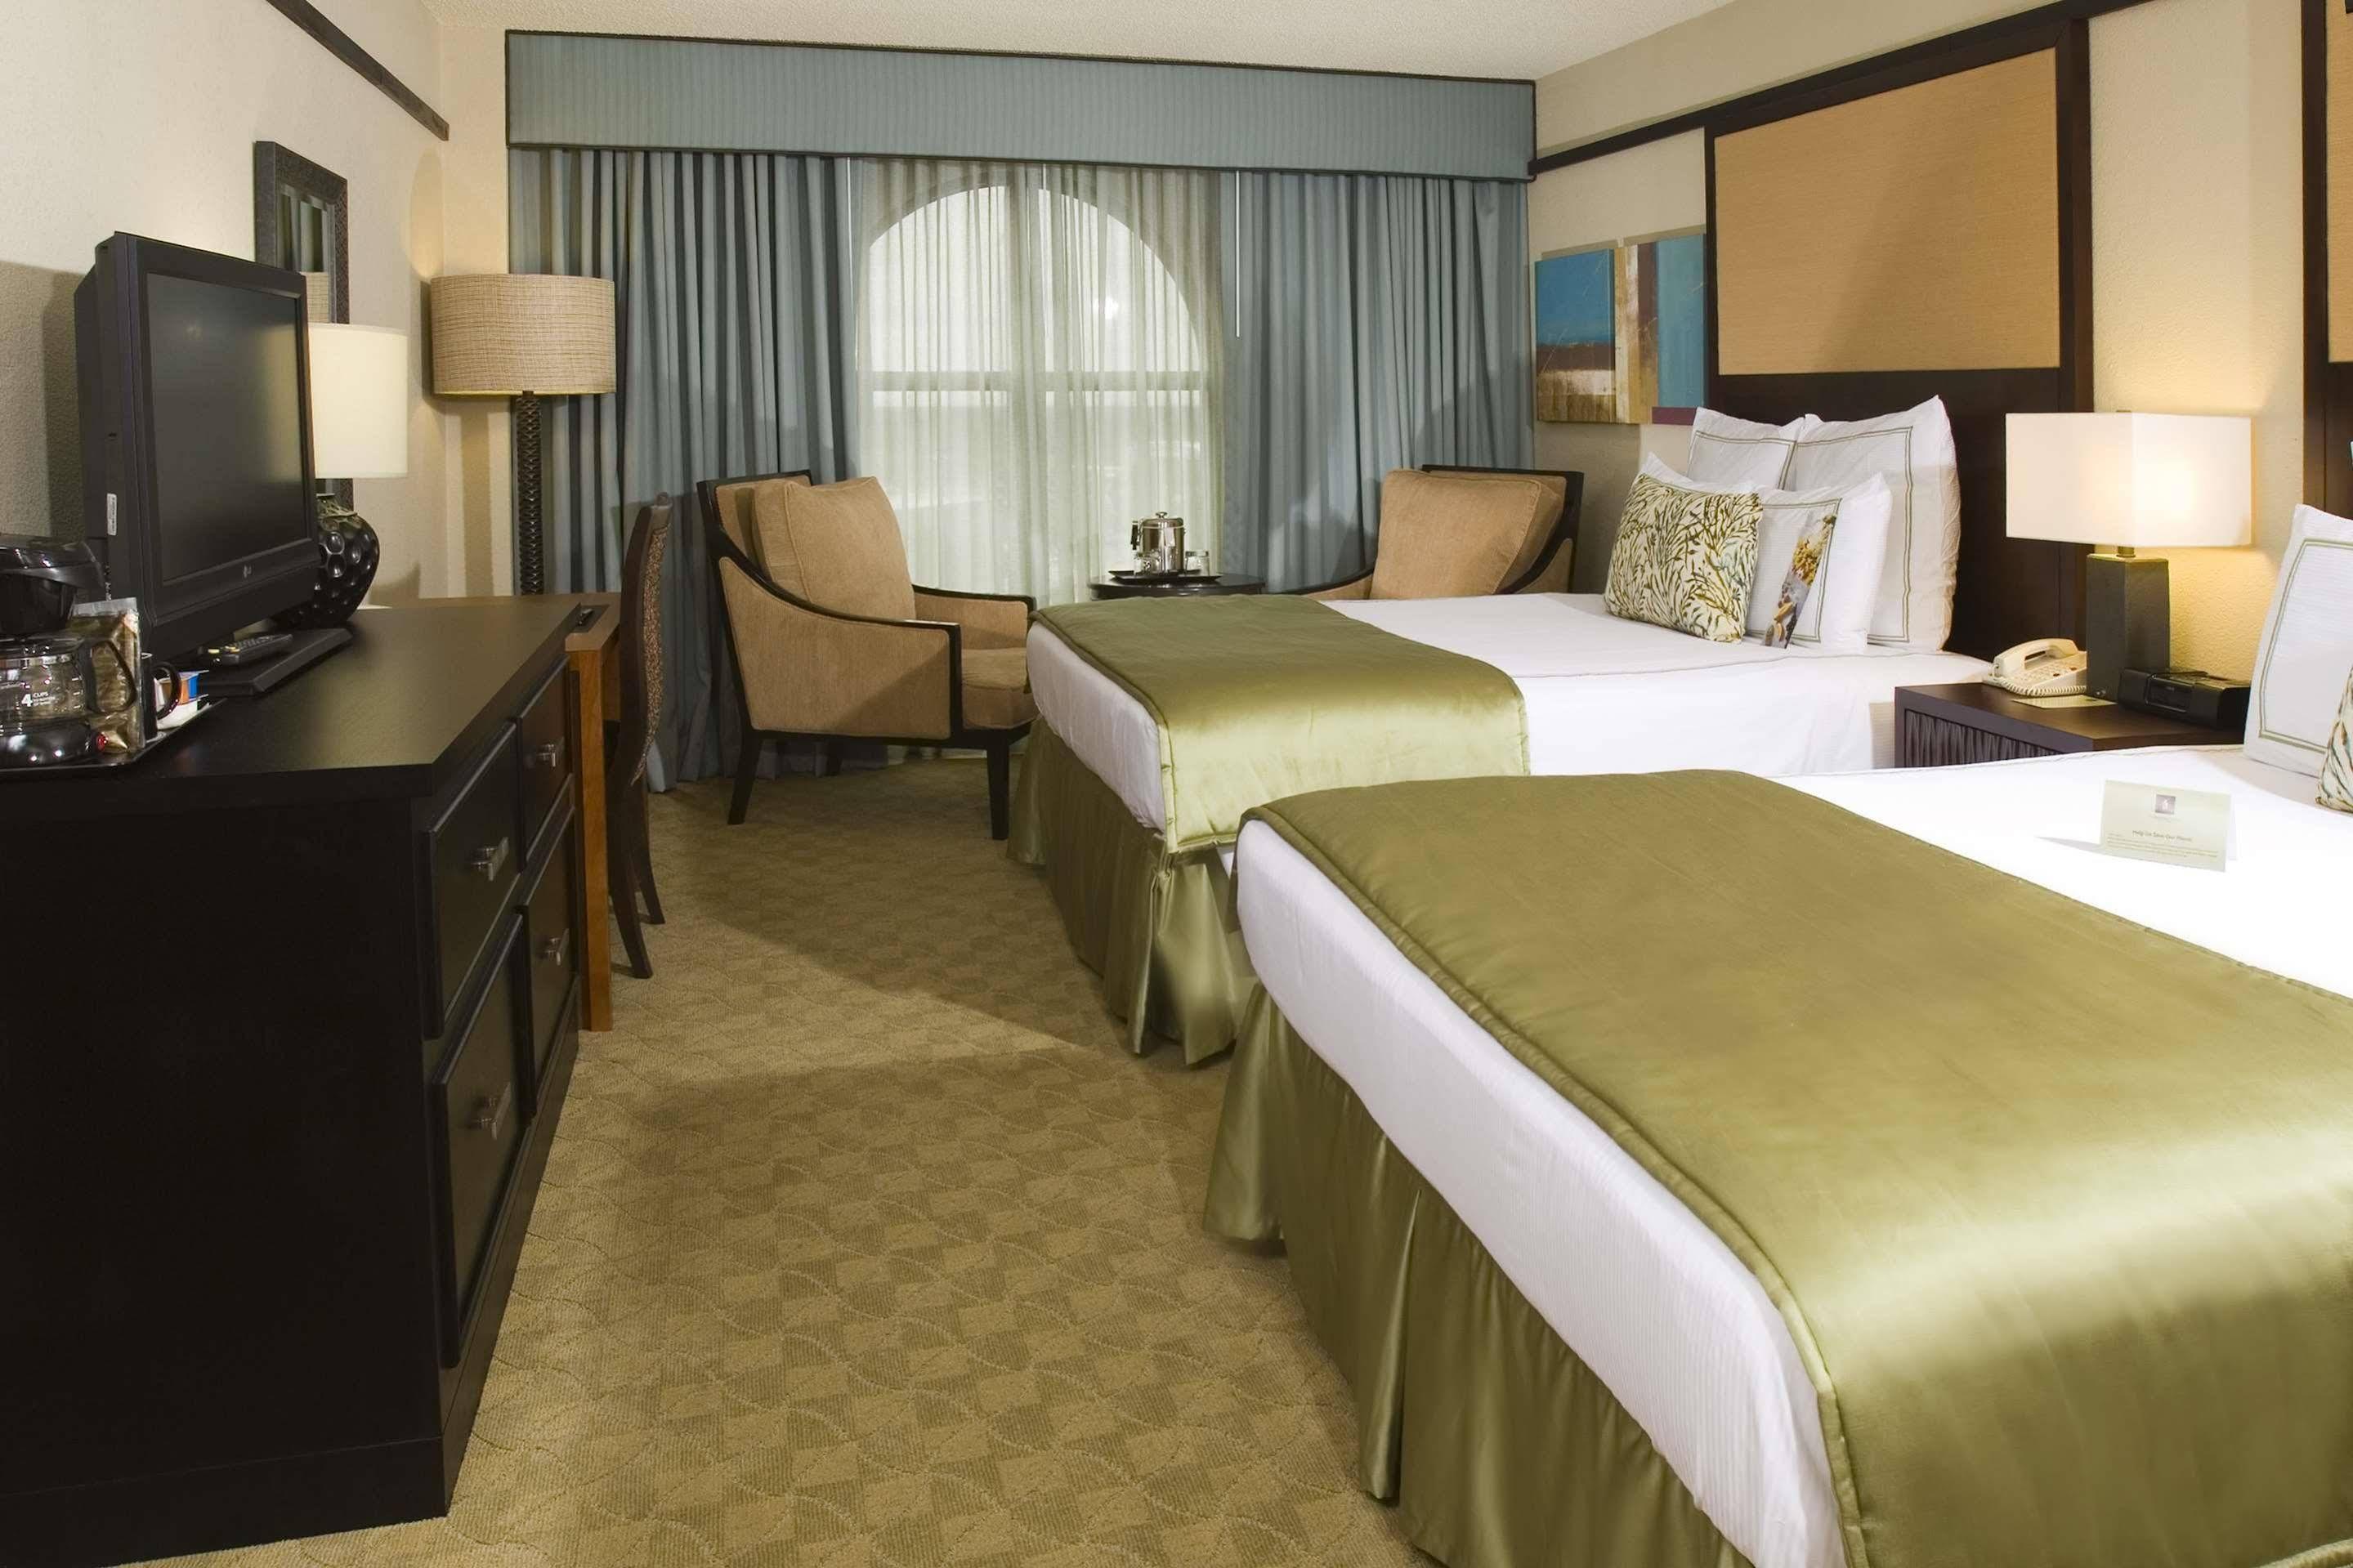 Orlando Hotels - Cheap Hotels in Orlando | Otel.com